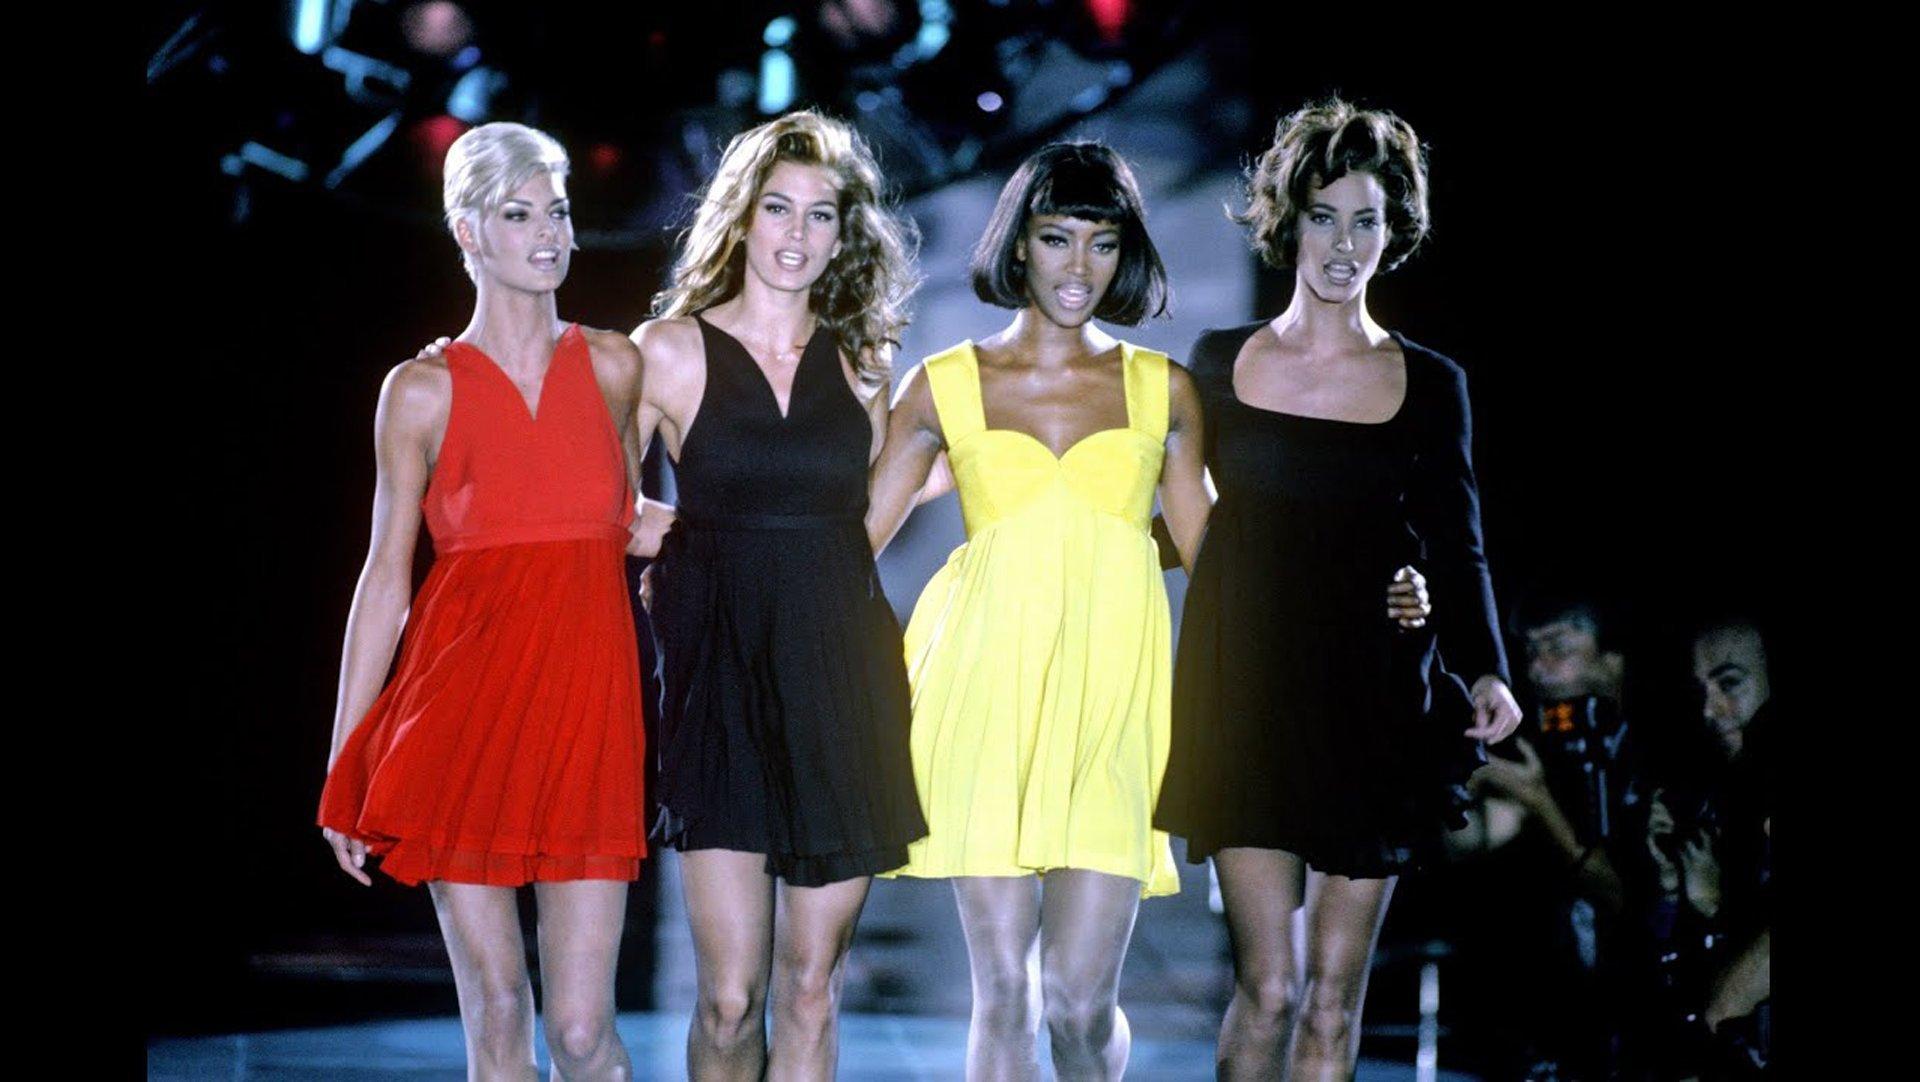 sfilata versace, freedom, autunno inverno 1991-1992, Campbell, Crawford, Turlington ed Evangelista